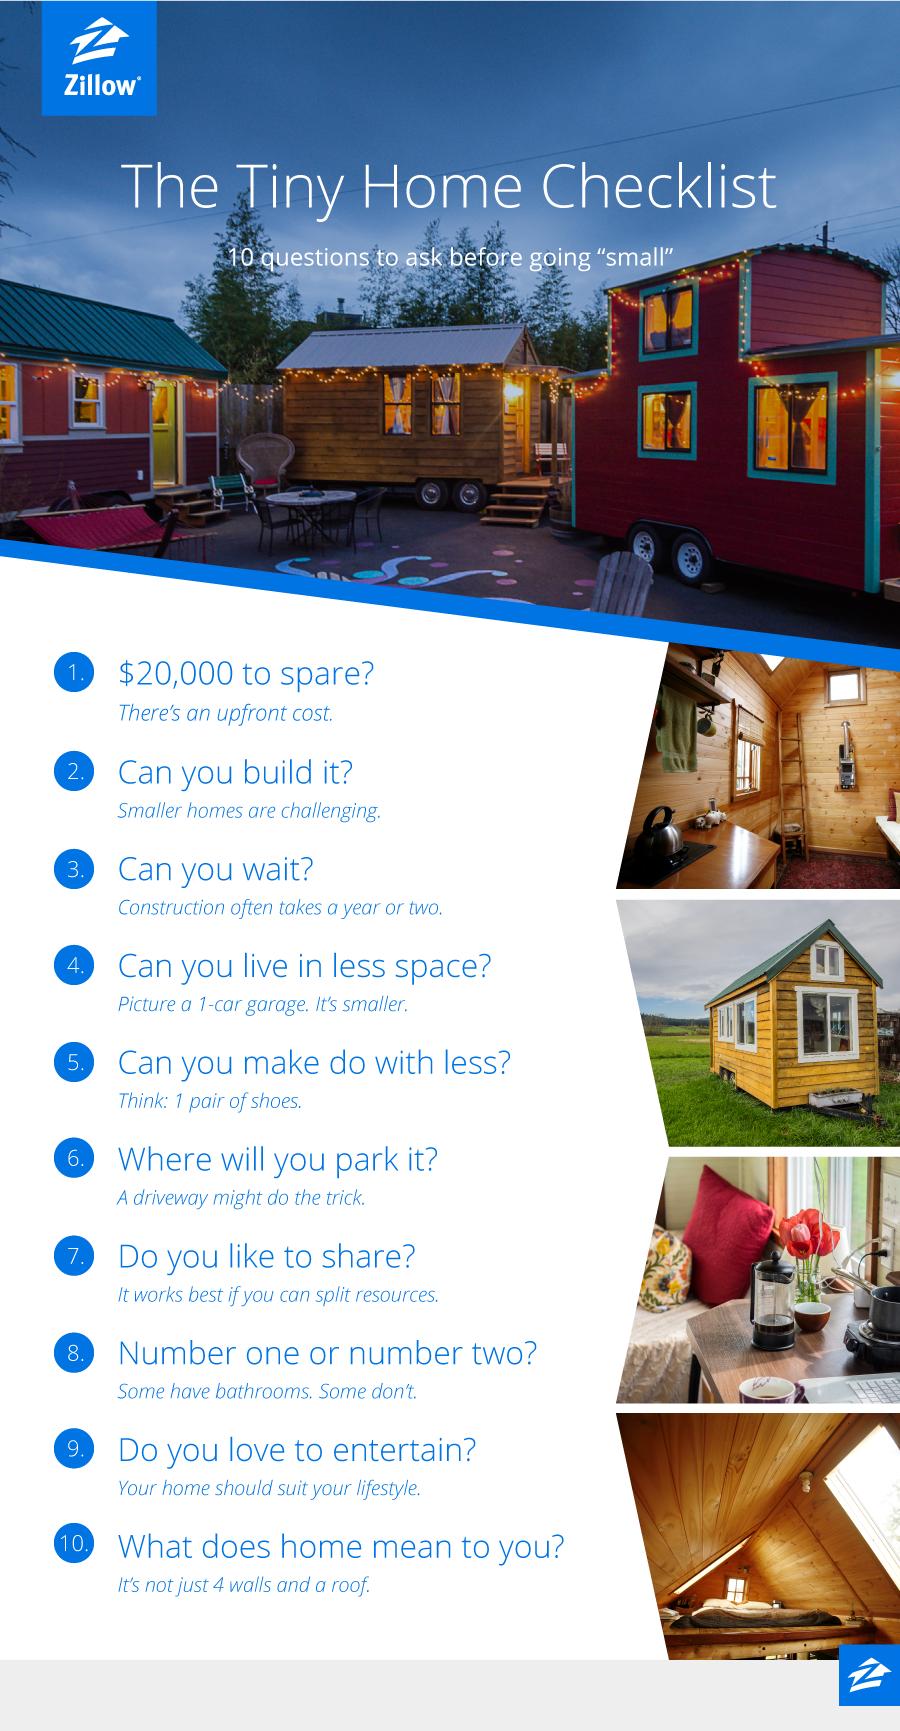 The Tiny Home Checklist